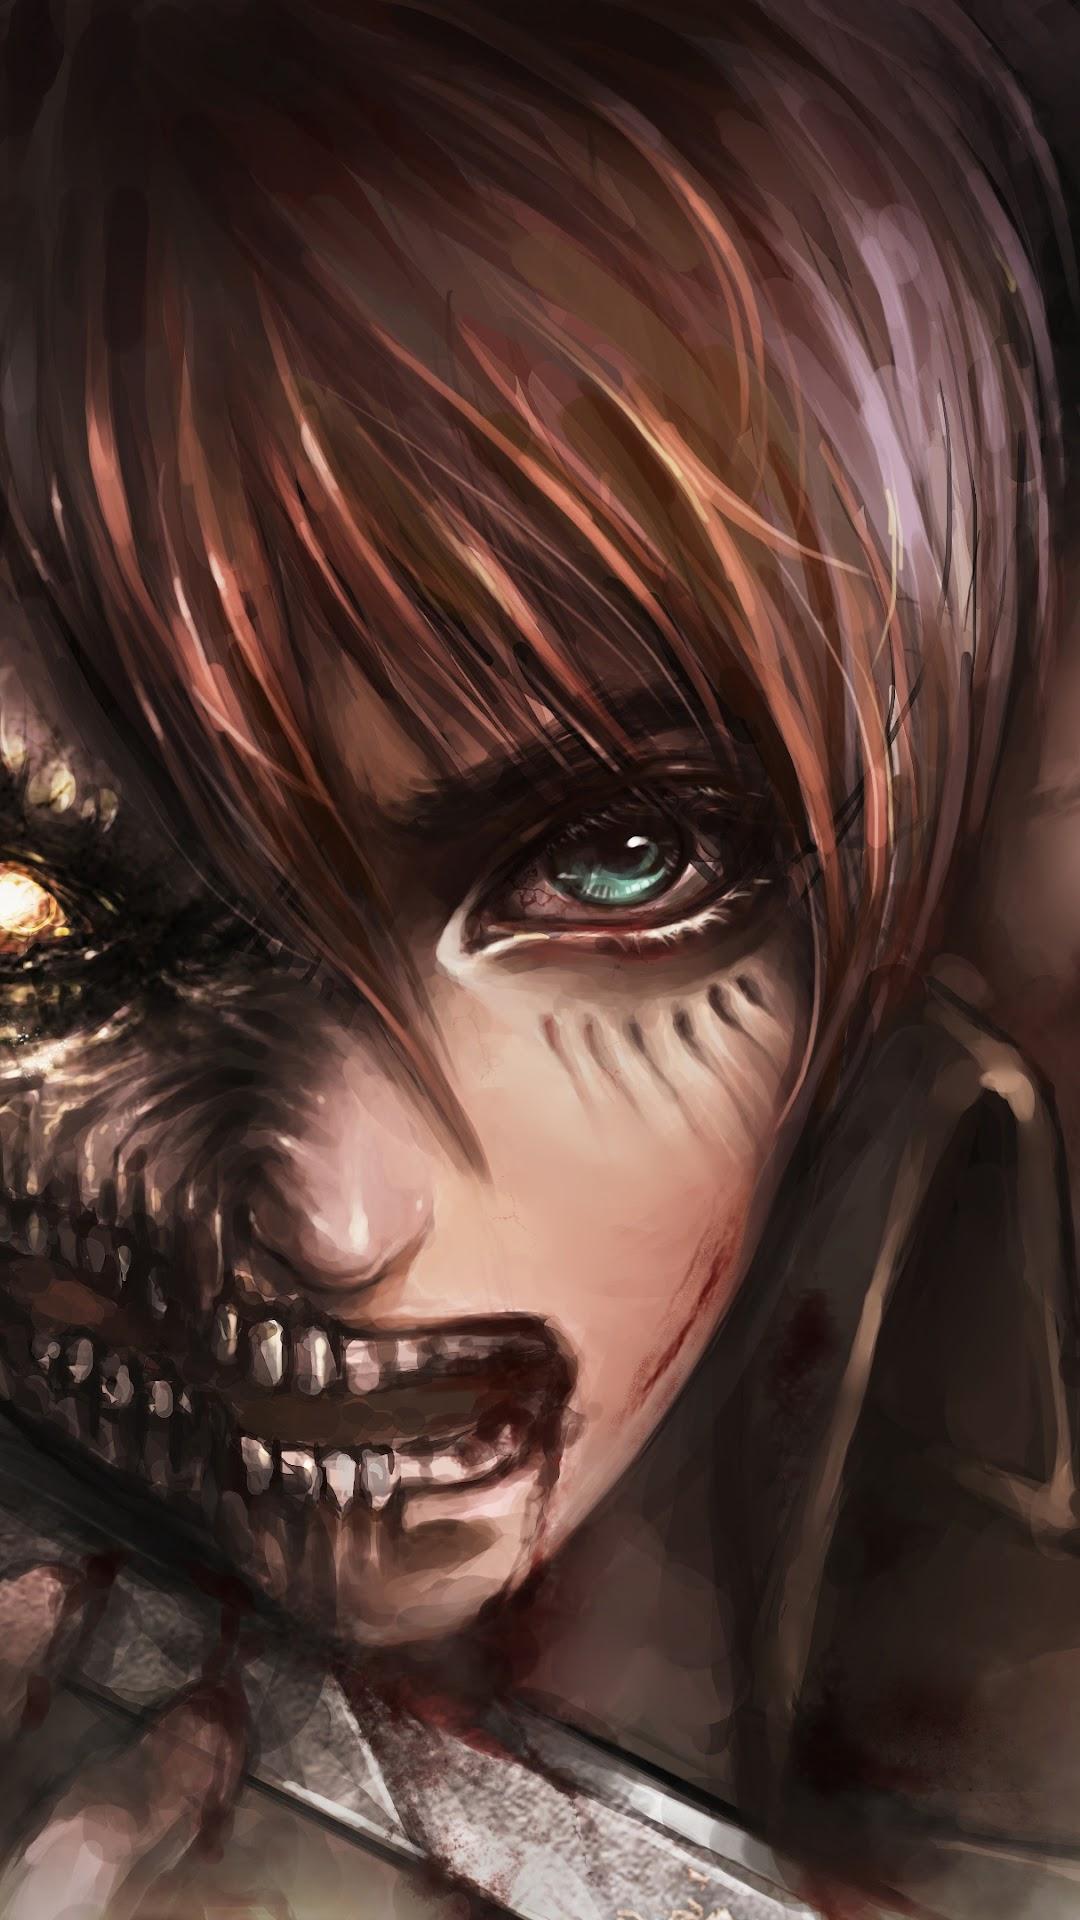 Eren And Levi Attack On Titan 4k Wallpaper 112